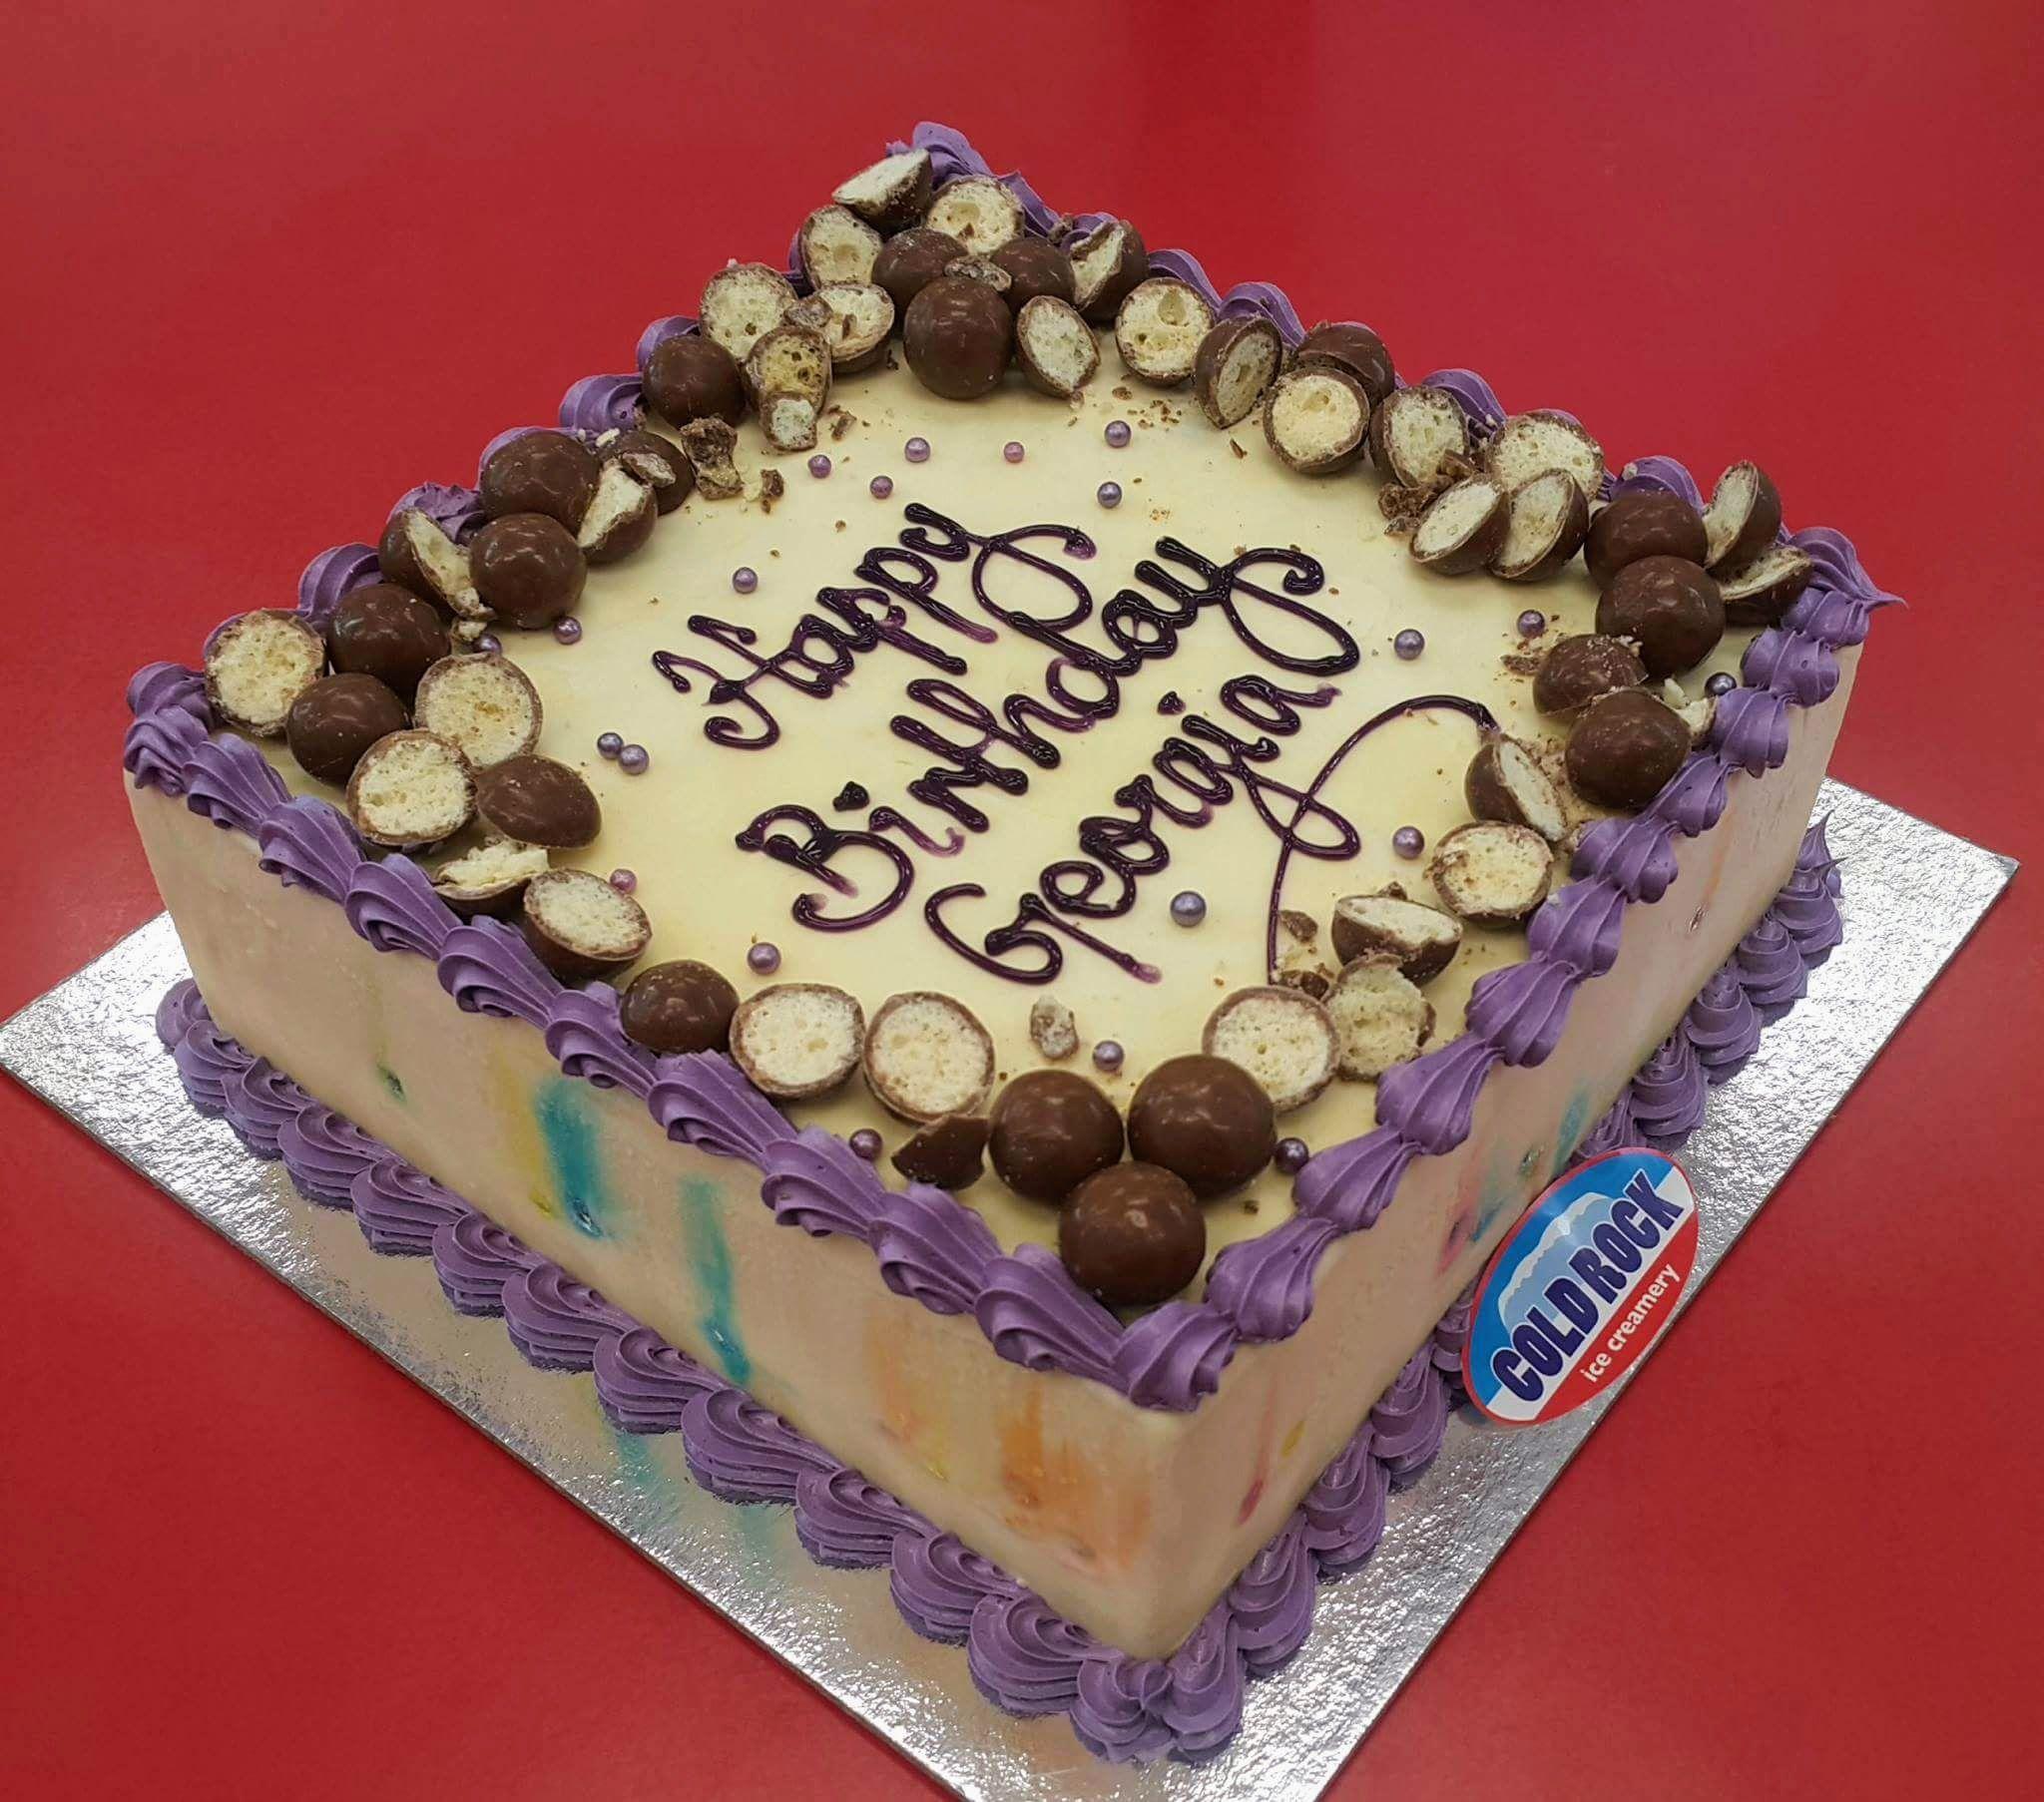 Cold Rock Birthday Celebration Cake Coldrock Cakes Ice